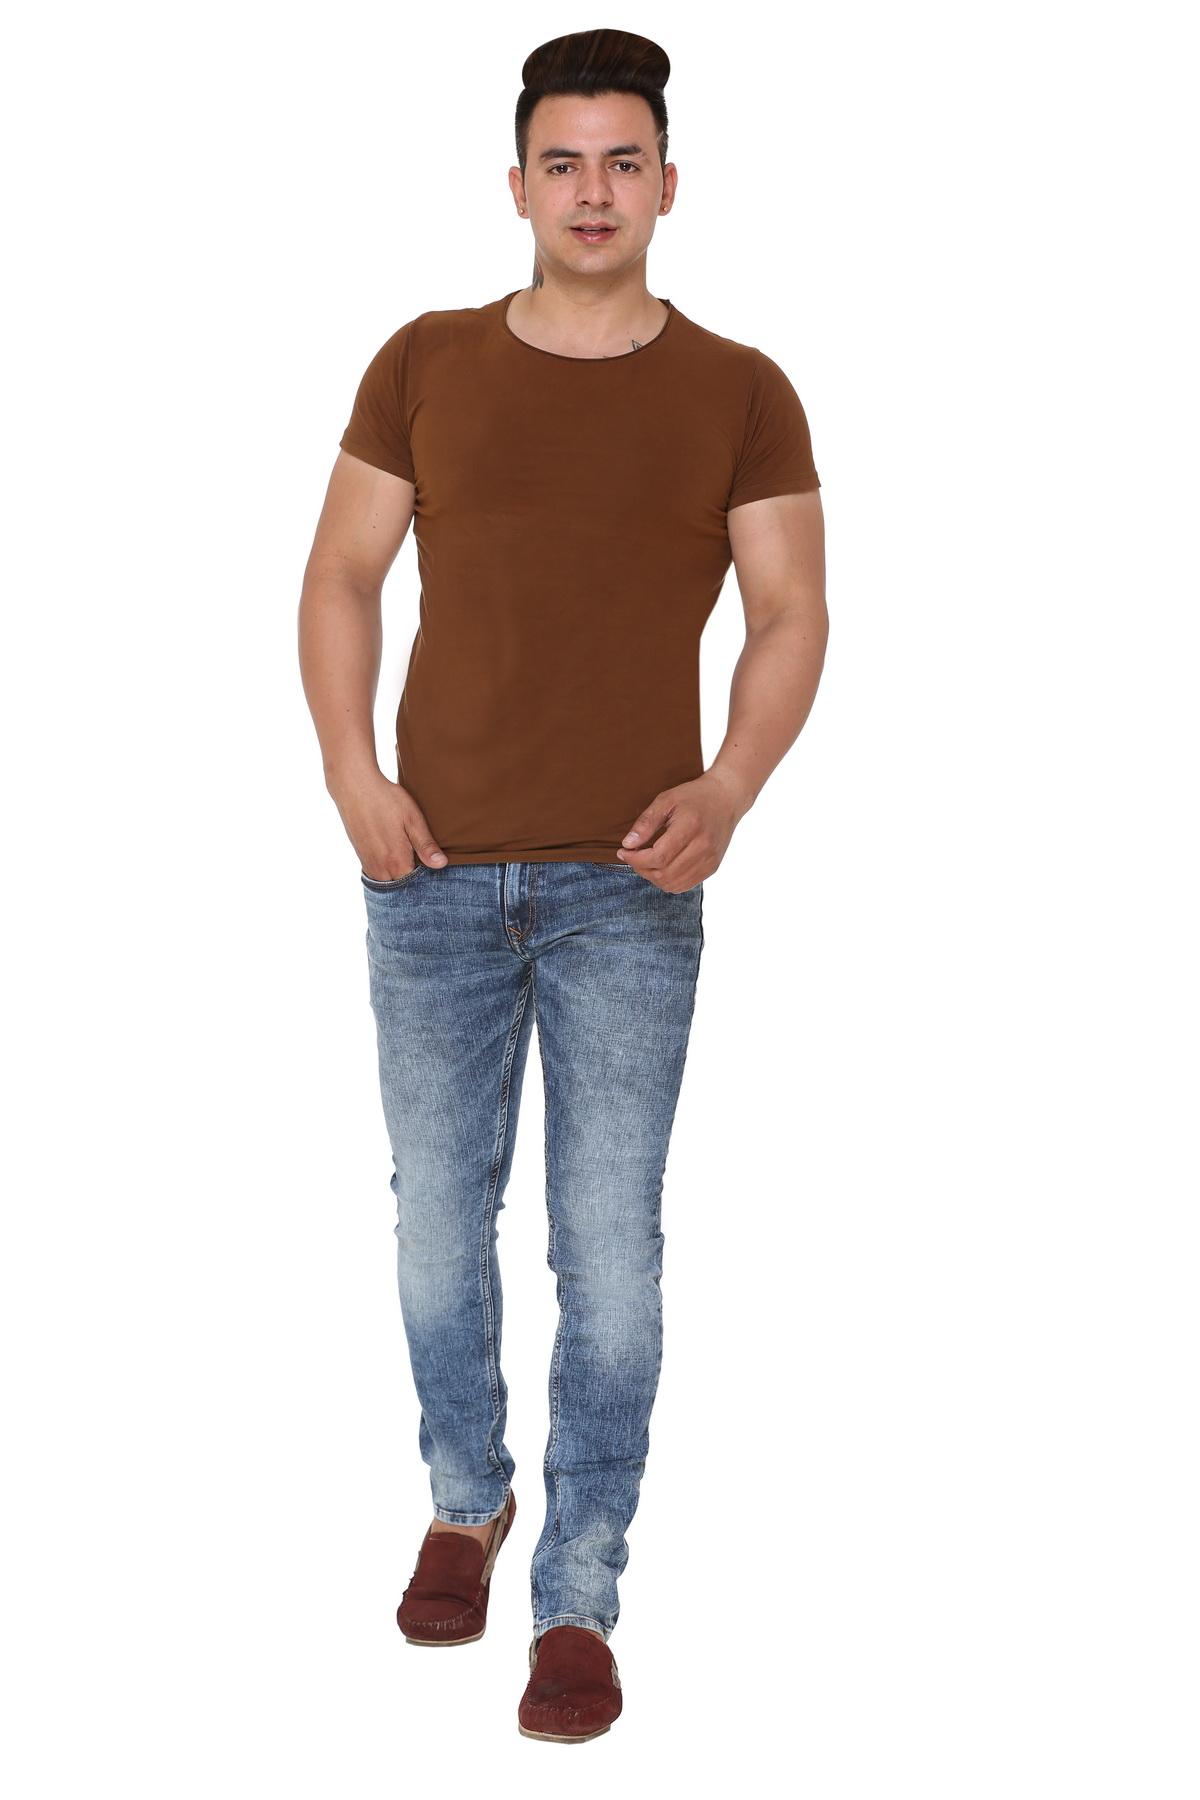 CASA Men's Cotton E-Denim